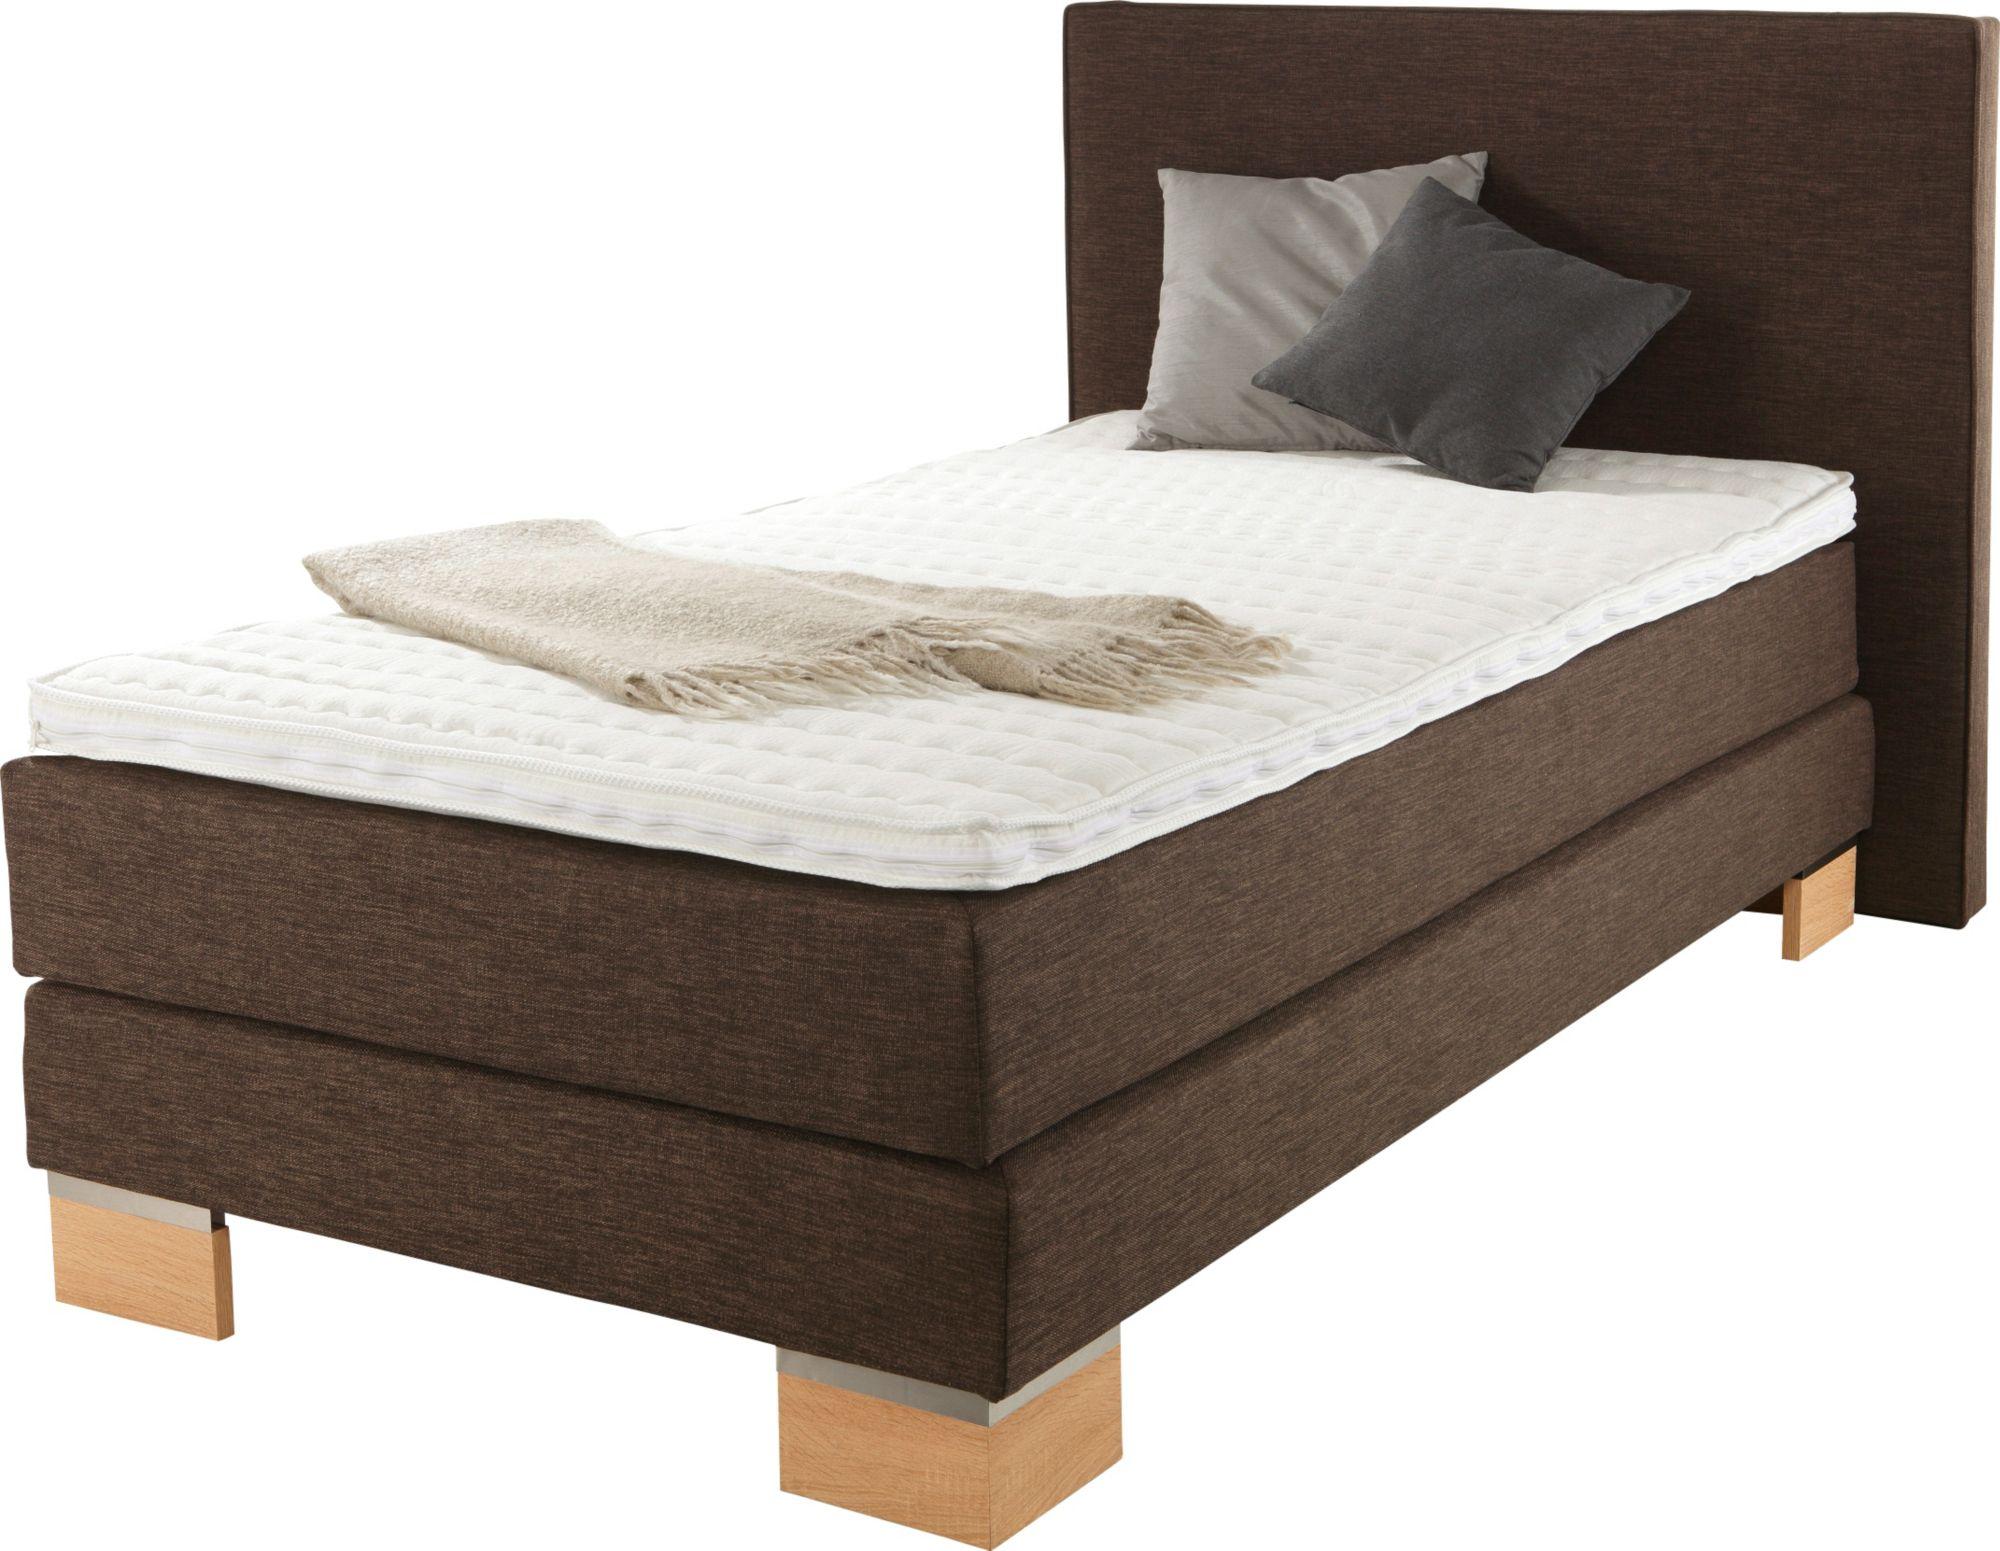 boxspringbett breckle schwab versand schlafm bel. Black Bedroom Furniture Sets. Home Design Ideas